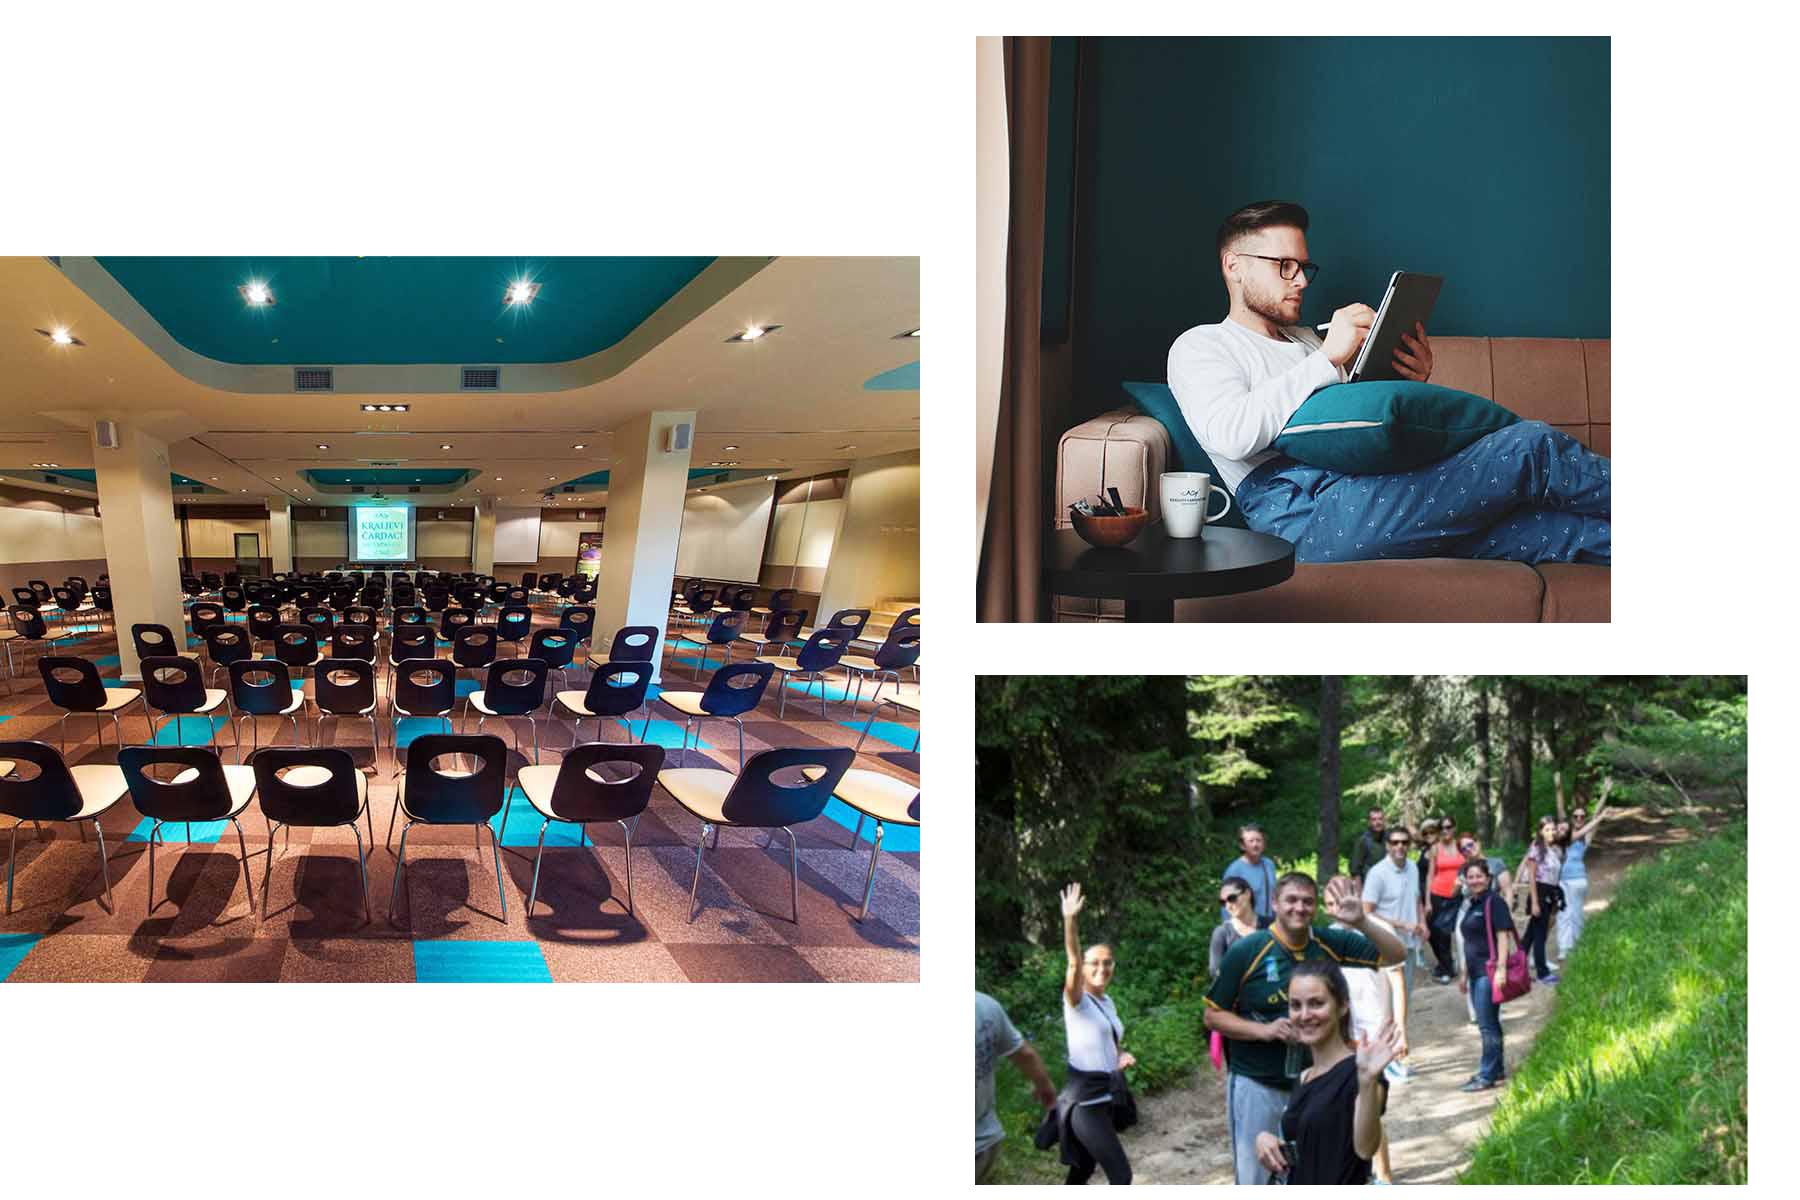 http://www.kraljevicardaci.com/wp-content/uploads/2021/04/kongress-vizual-sajt.png